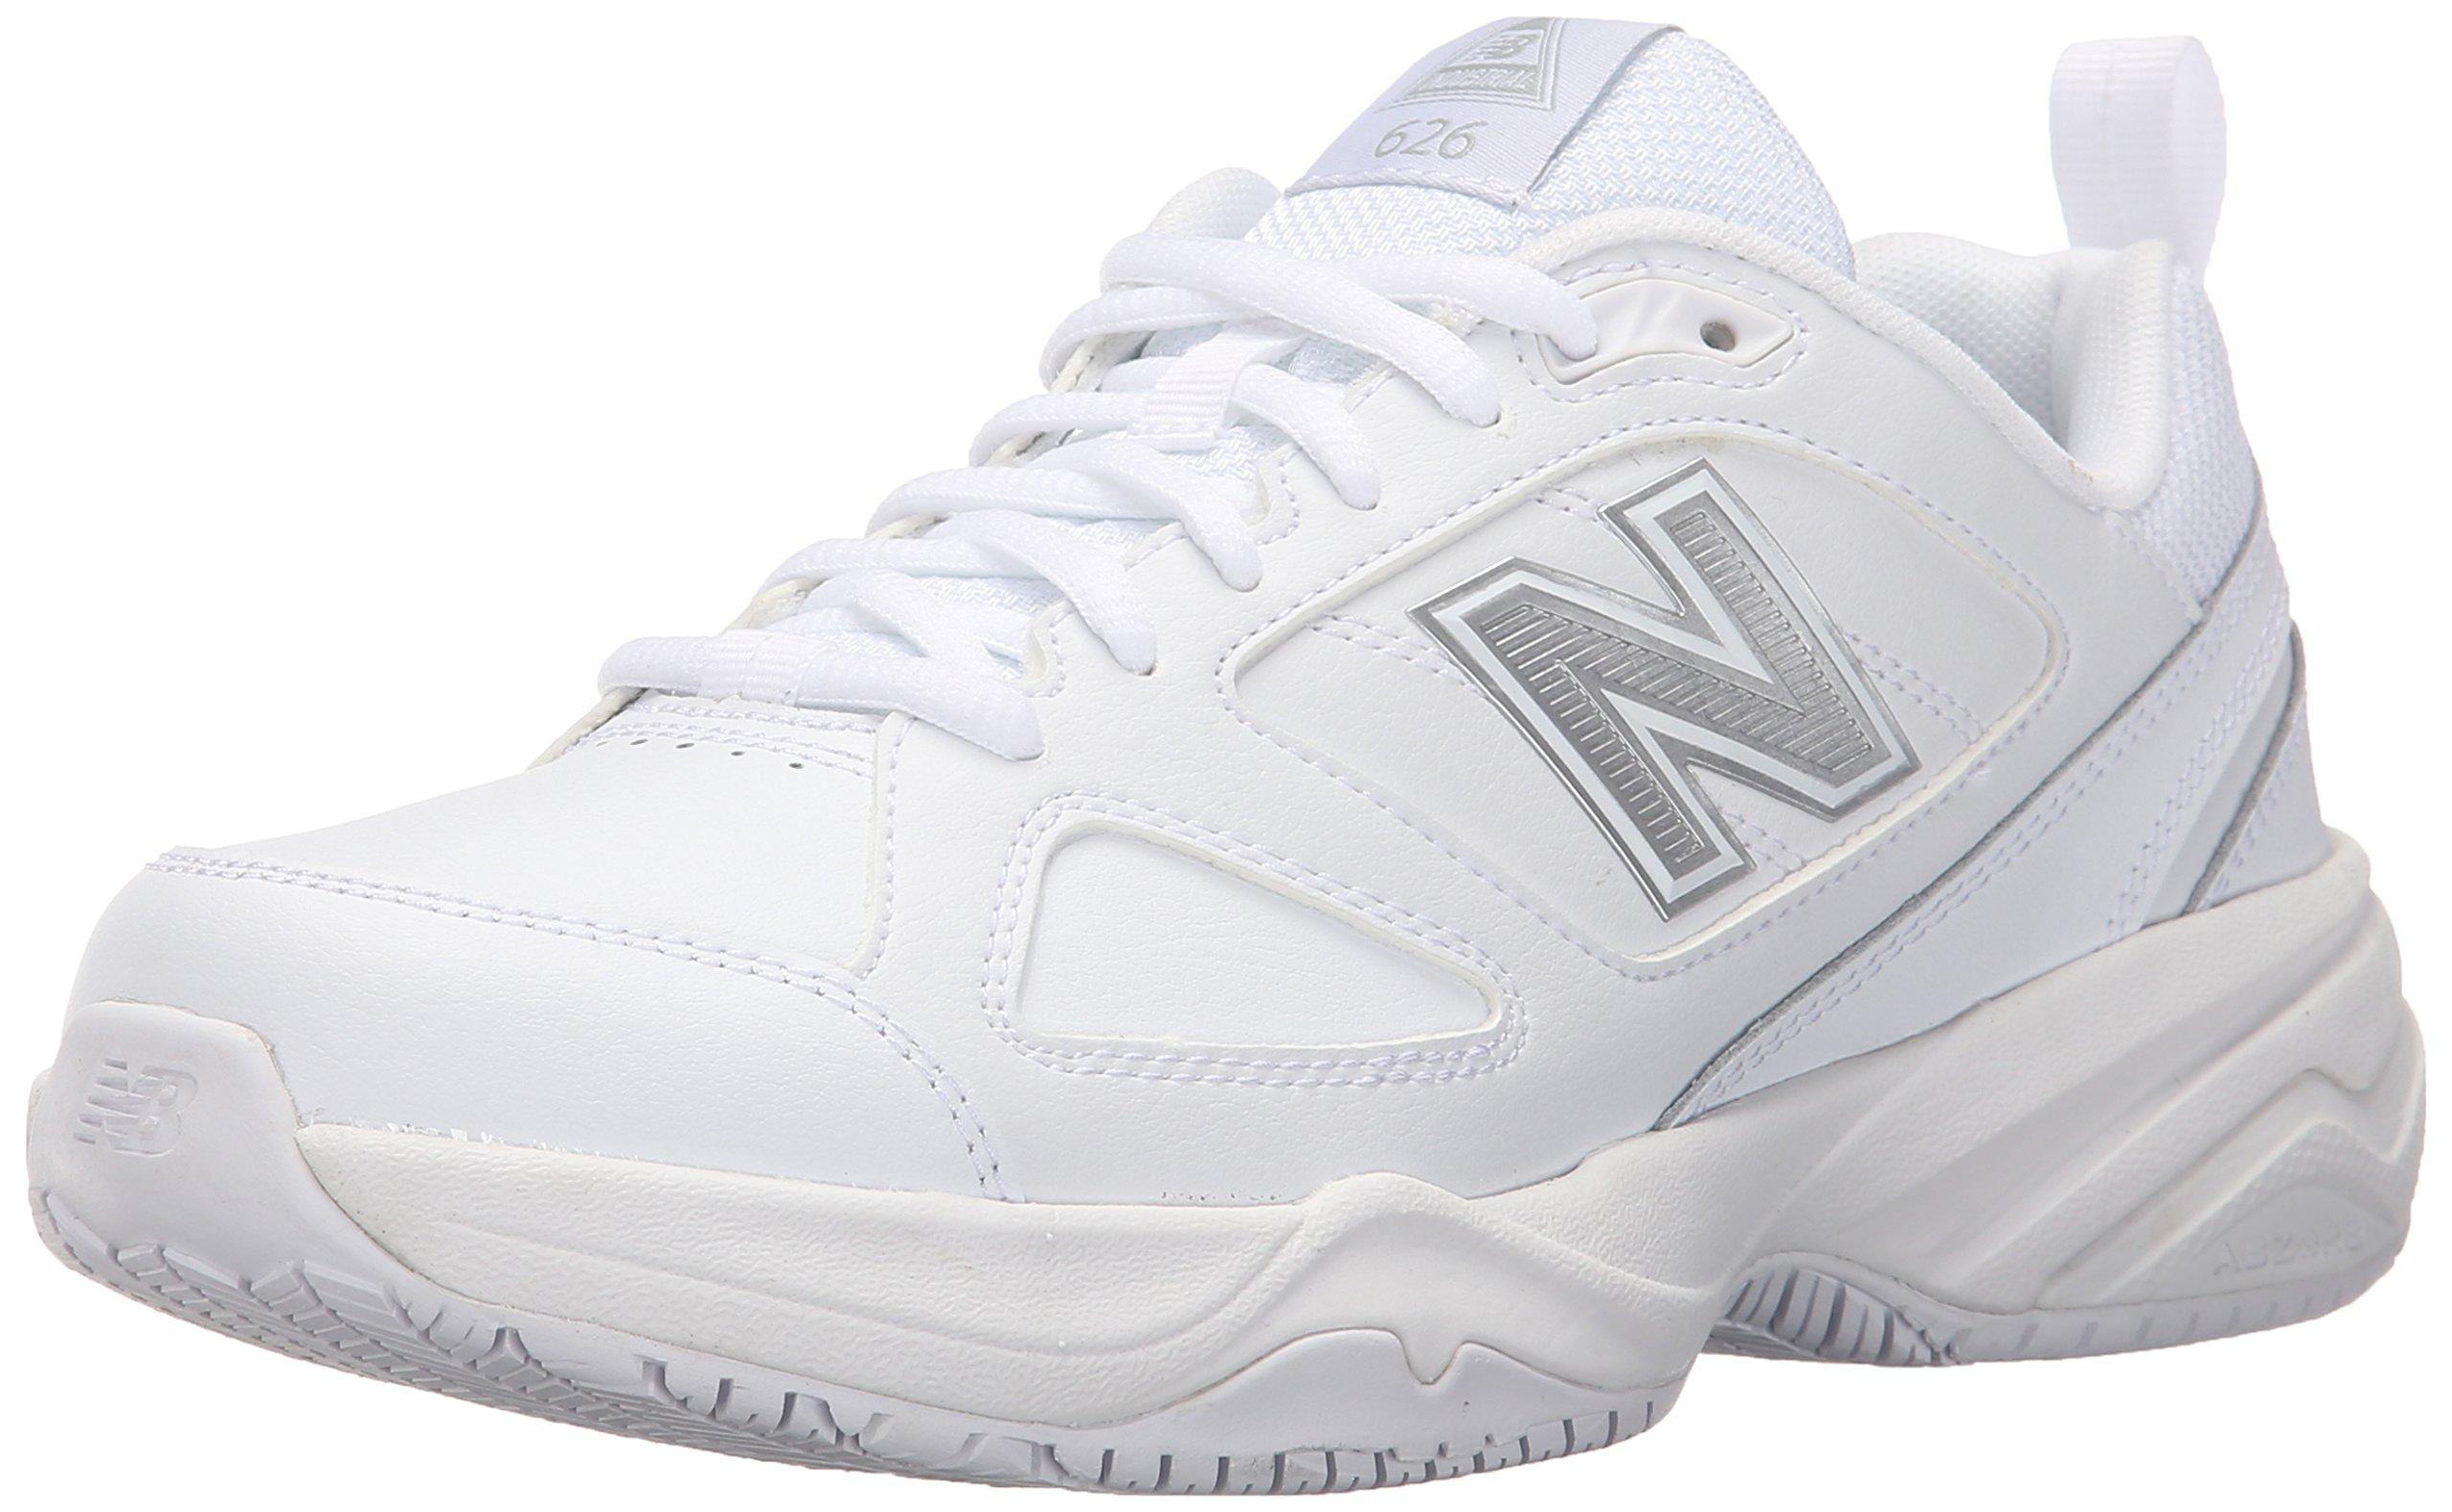 New Balance Women's WID626v2 Work Training Shoe, White, 12 D US